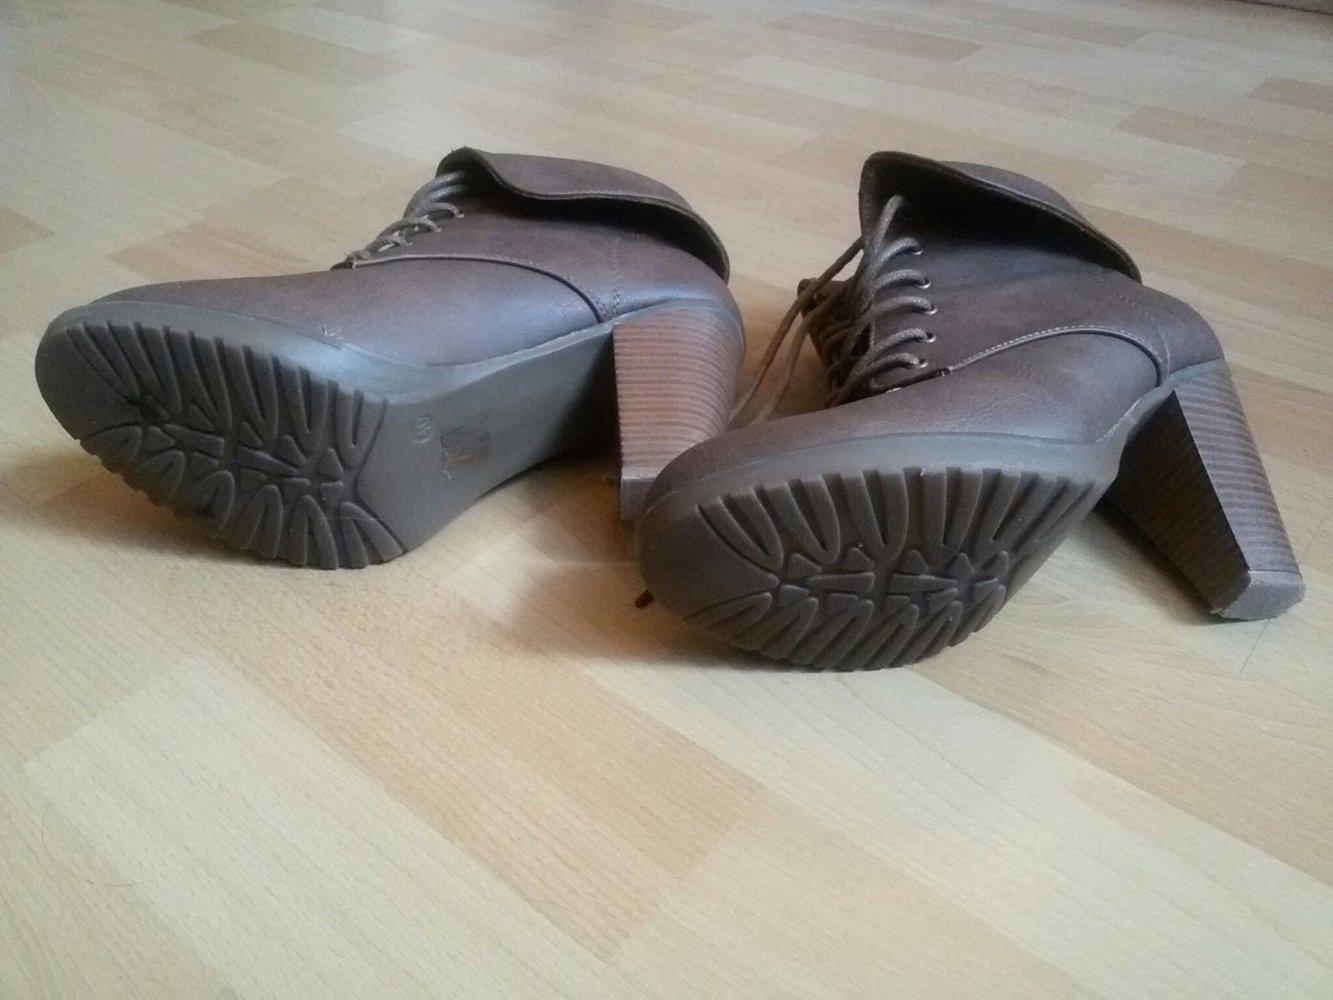 Mode Queen Schuhe Stiefeletten Braun Gr 40 Kleiderkorb De